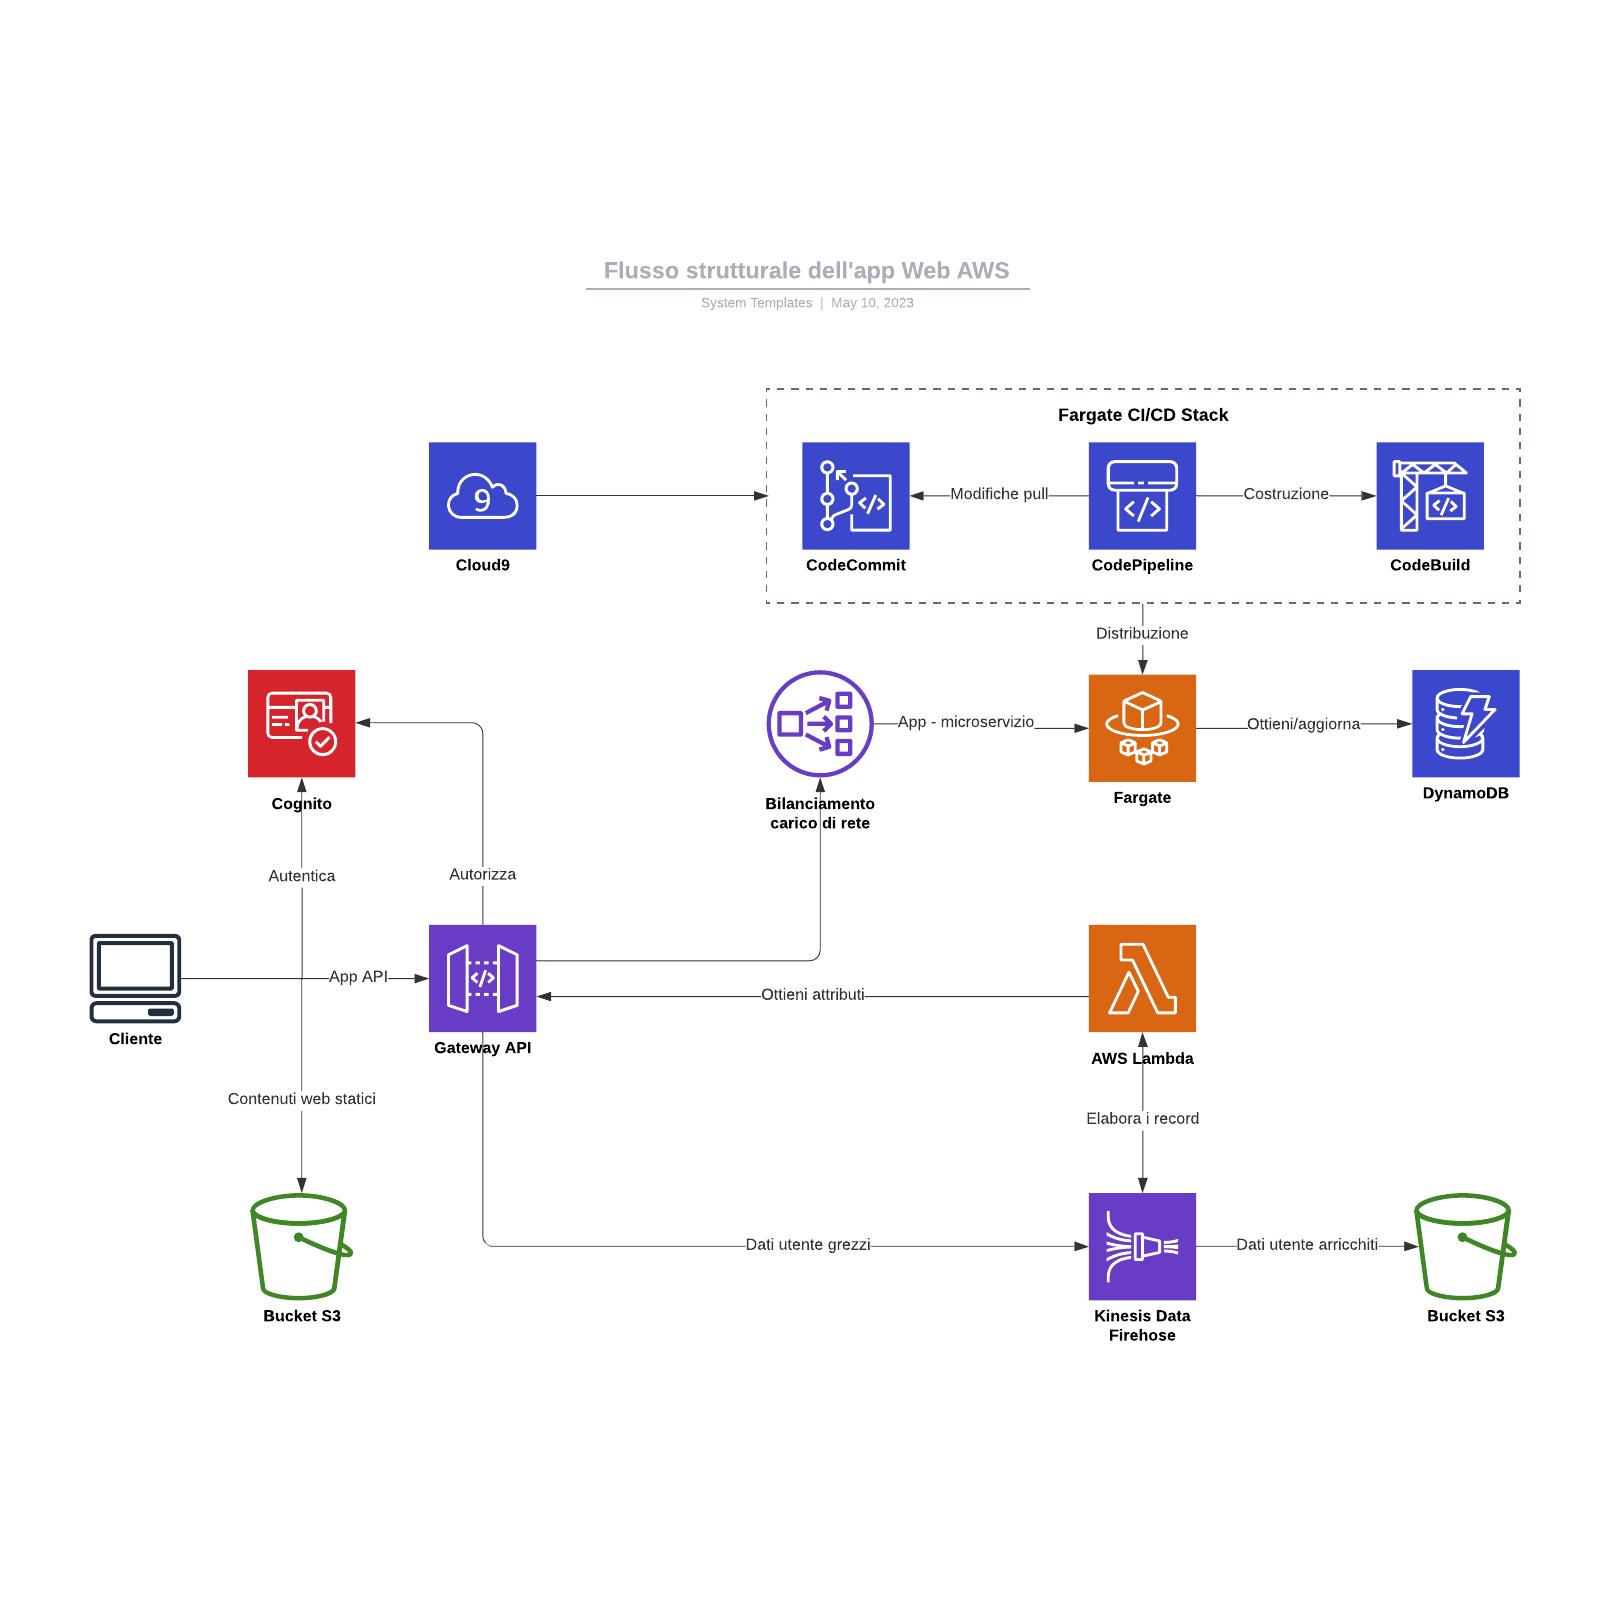 Flusso strutturale dell'app Web AWS